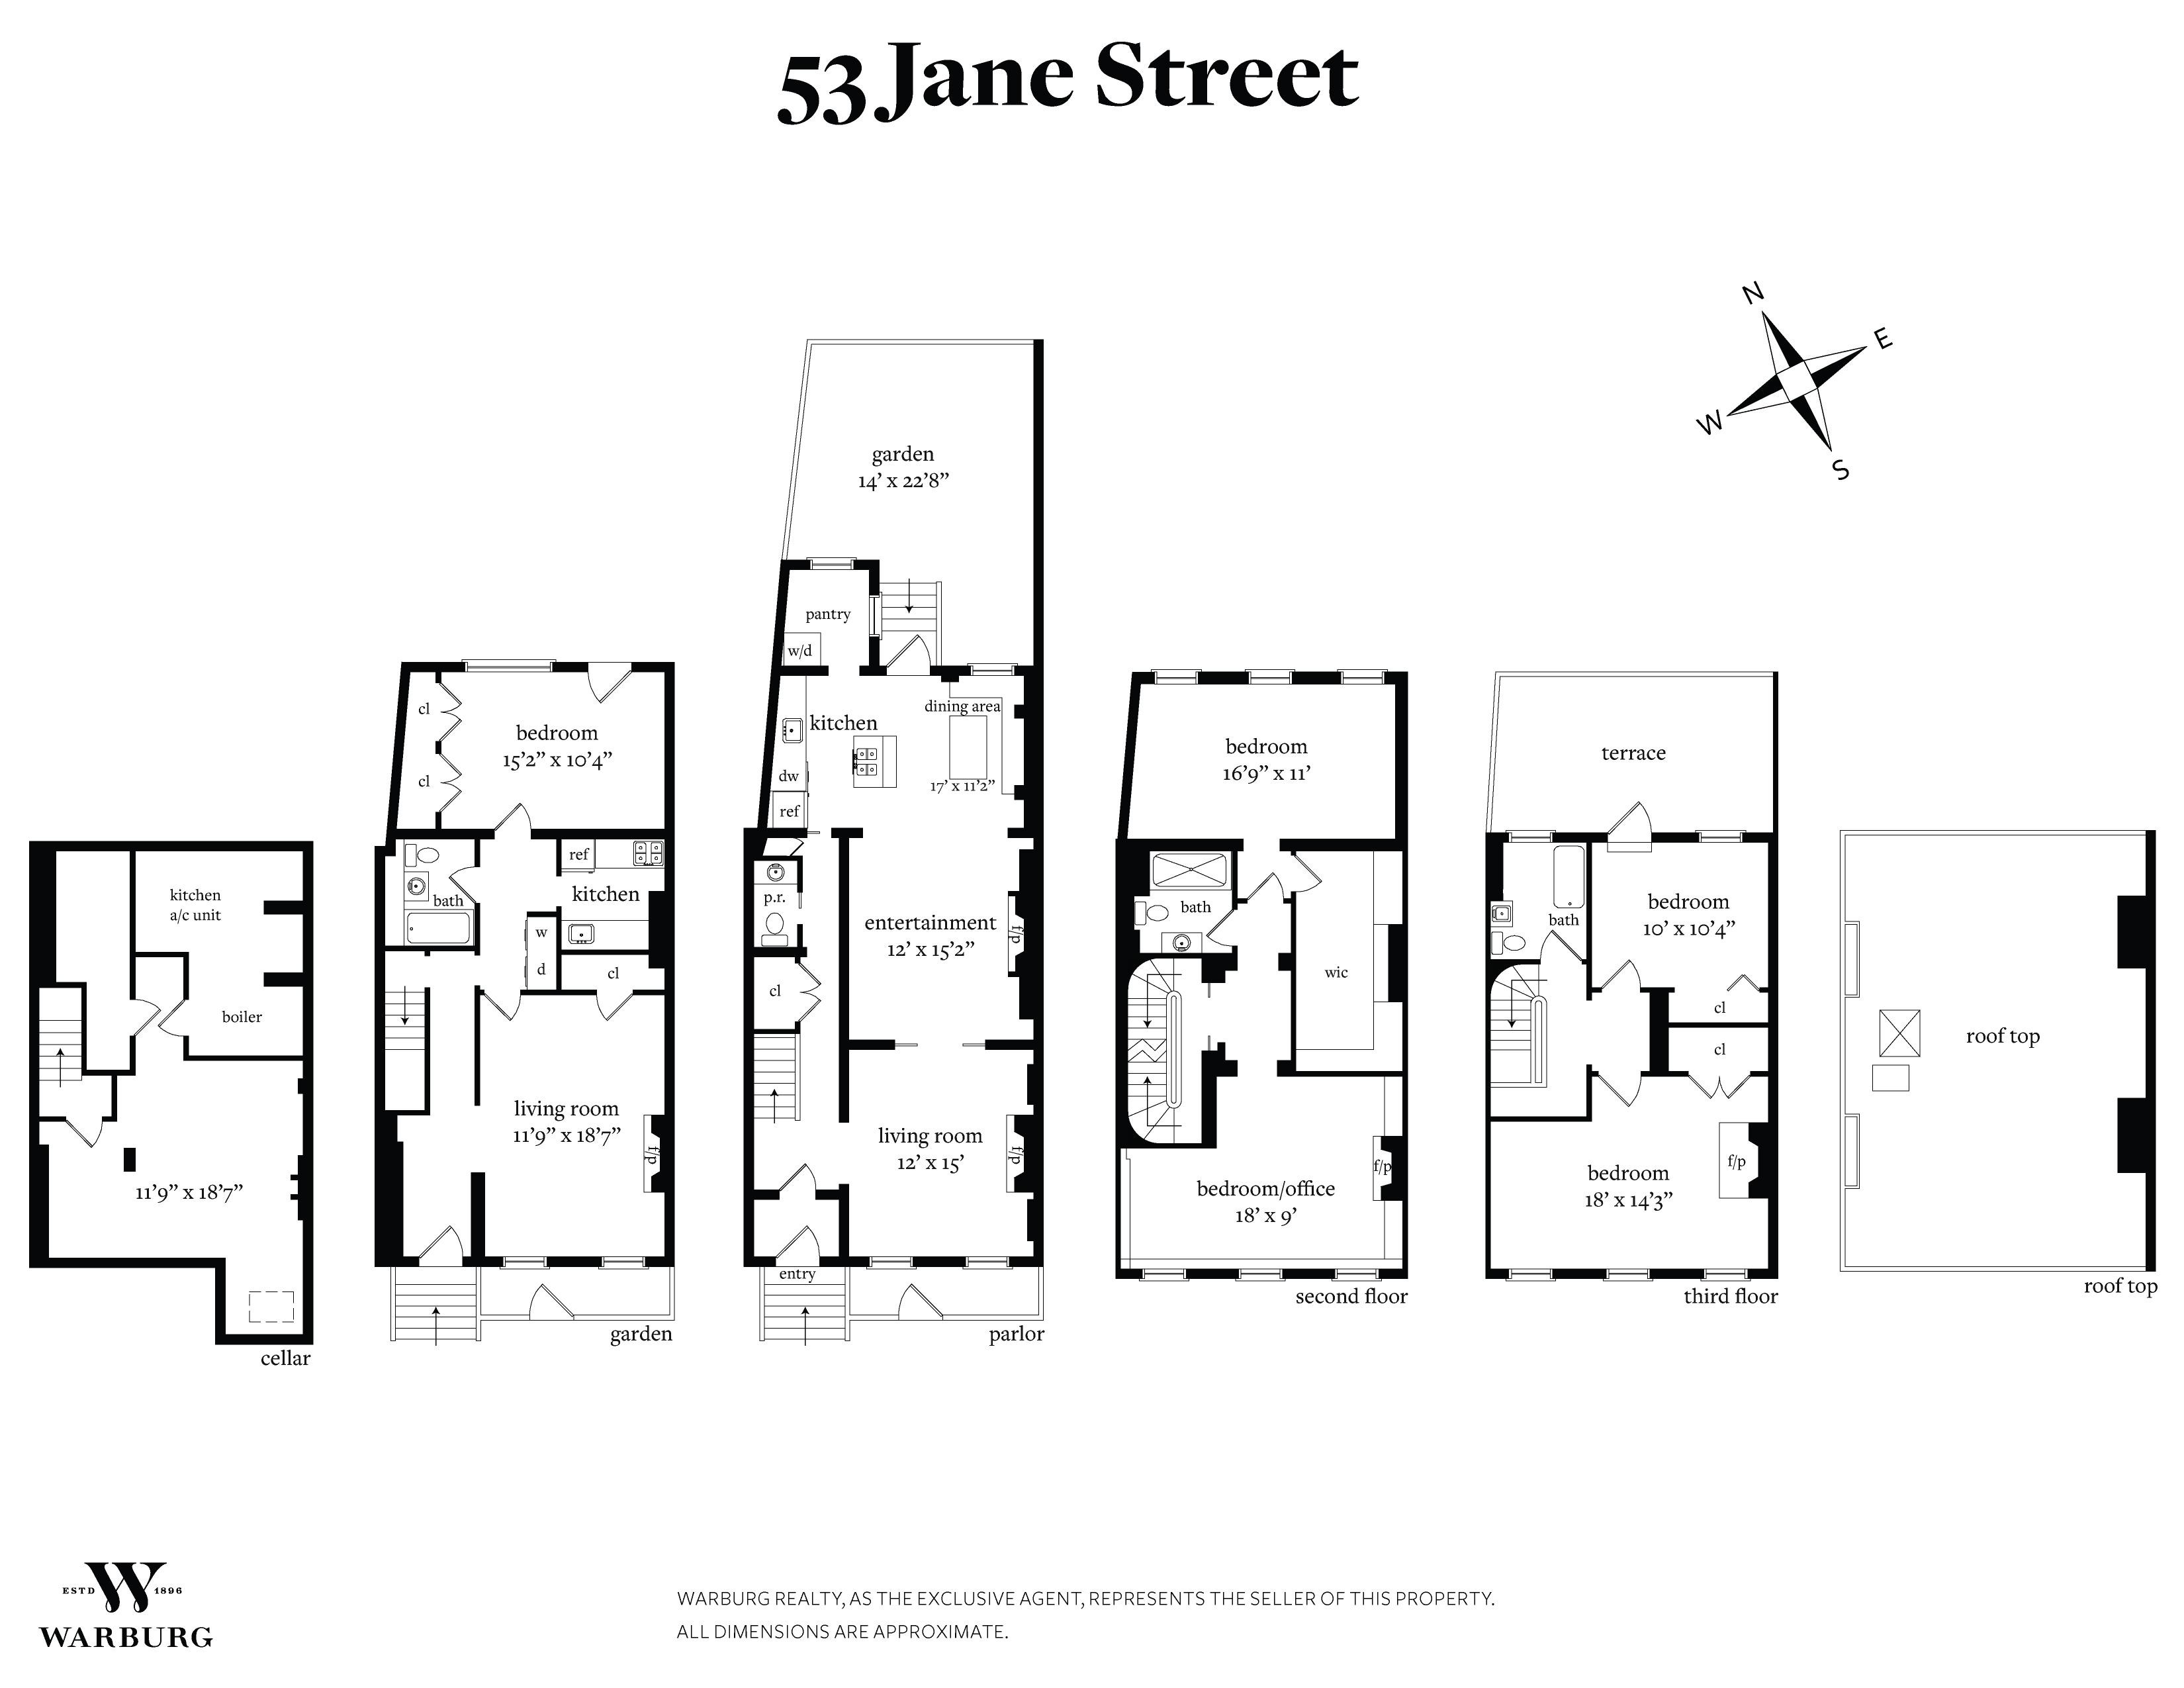 53 Jane St , Apt Building, West Village, NY 10014 - WR-292947